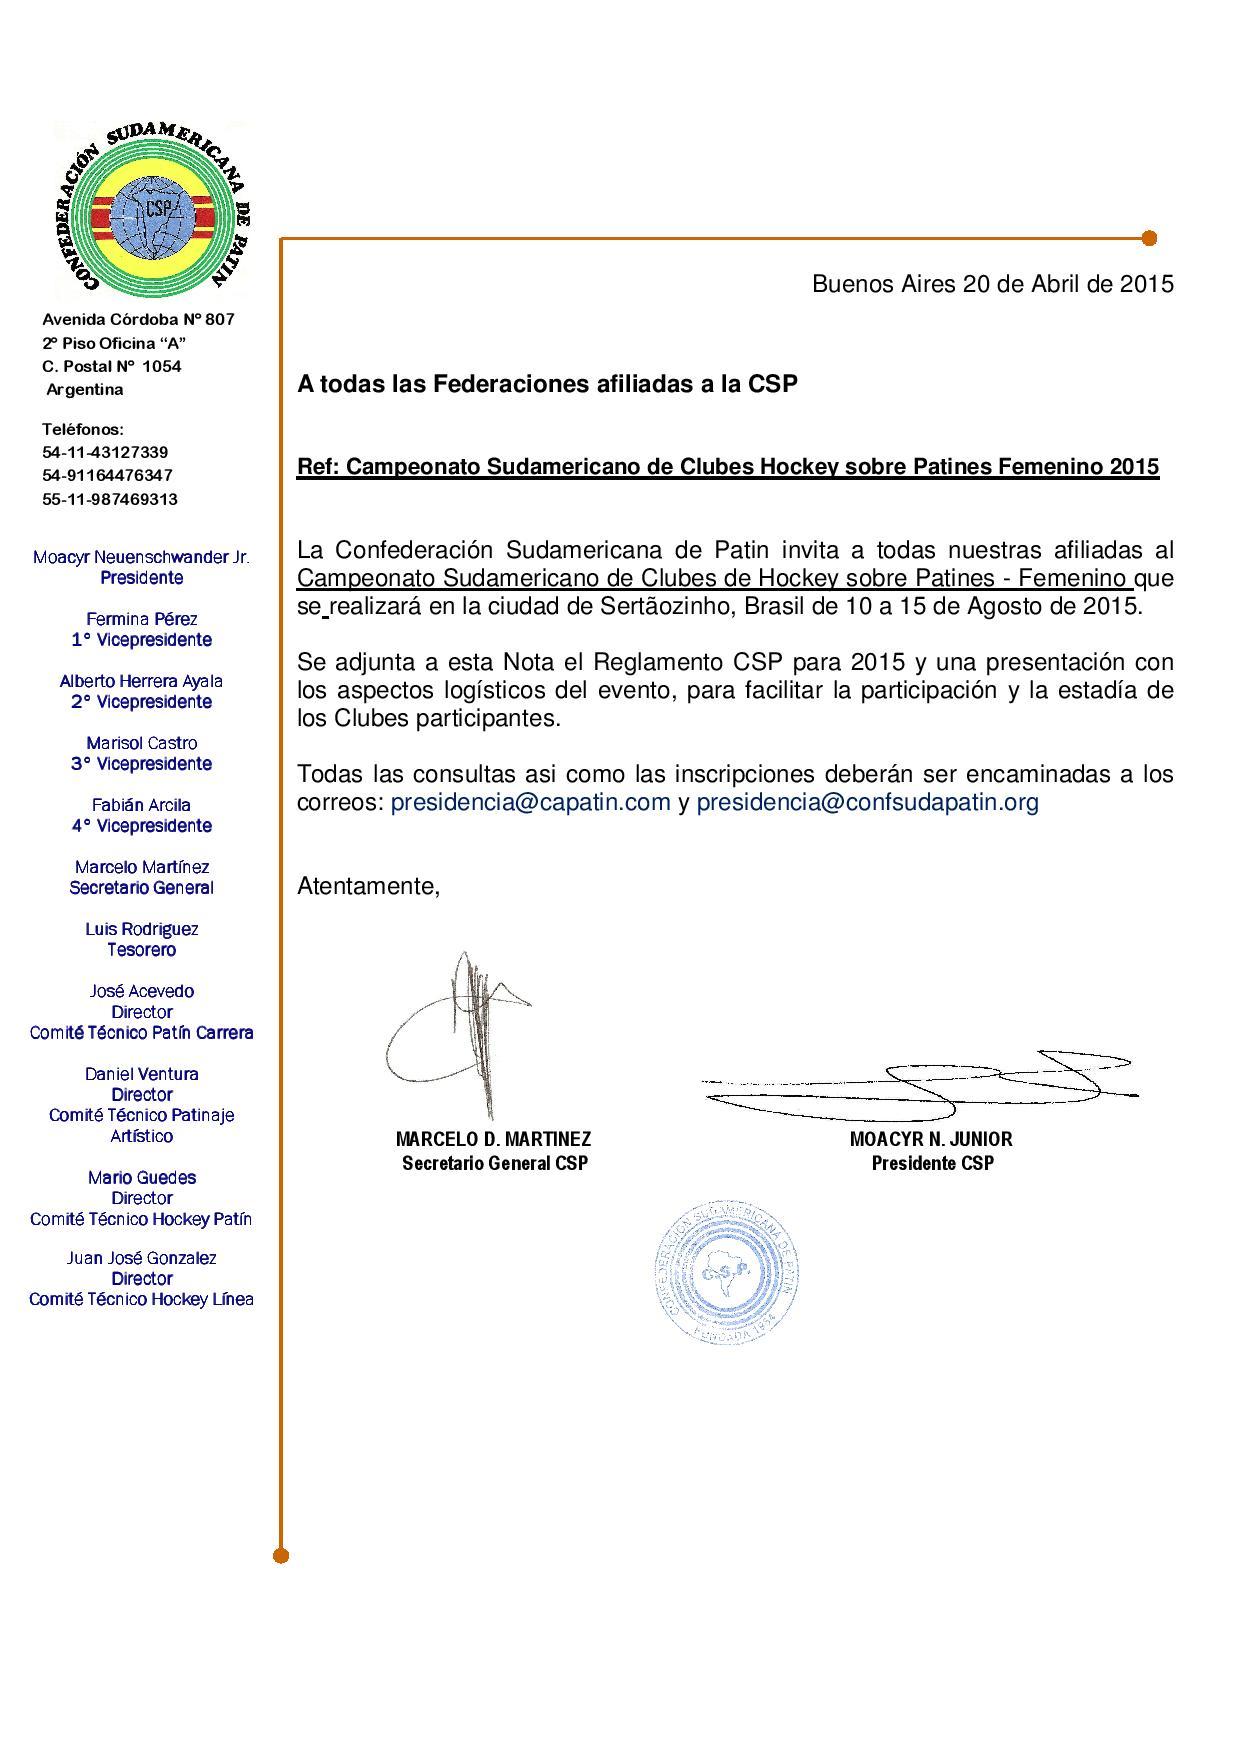 Invitacion-SudamericanoHockeyFemenino2015-page-001